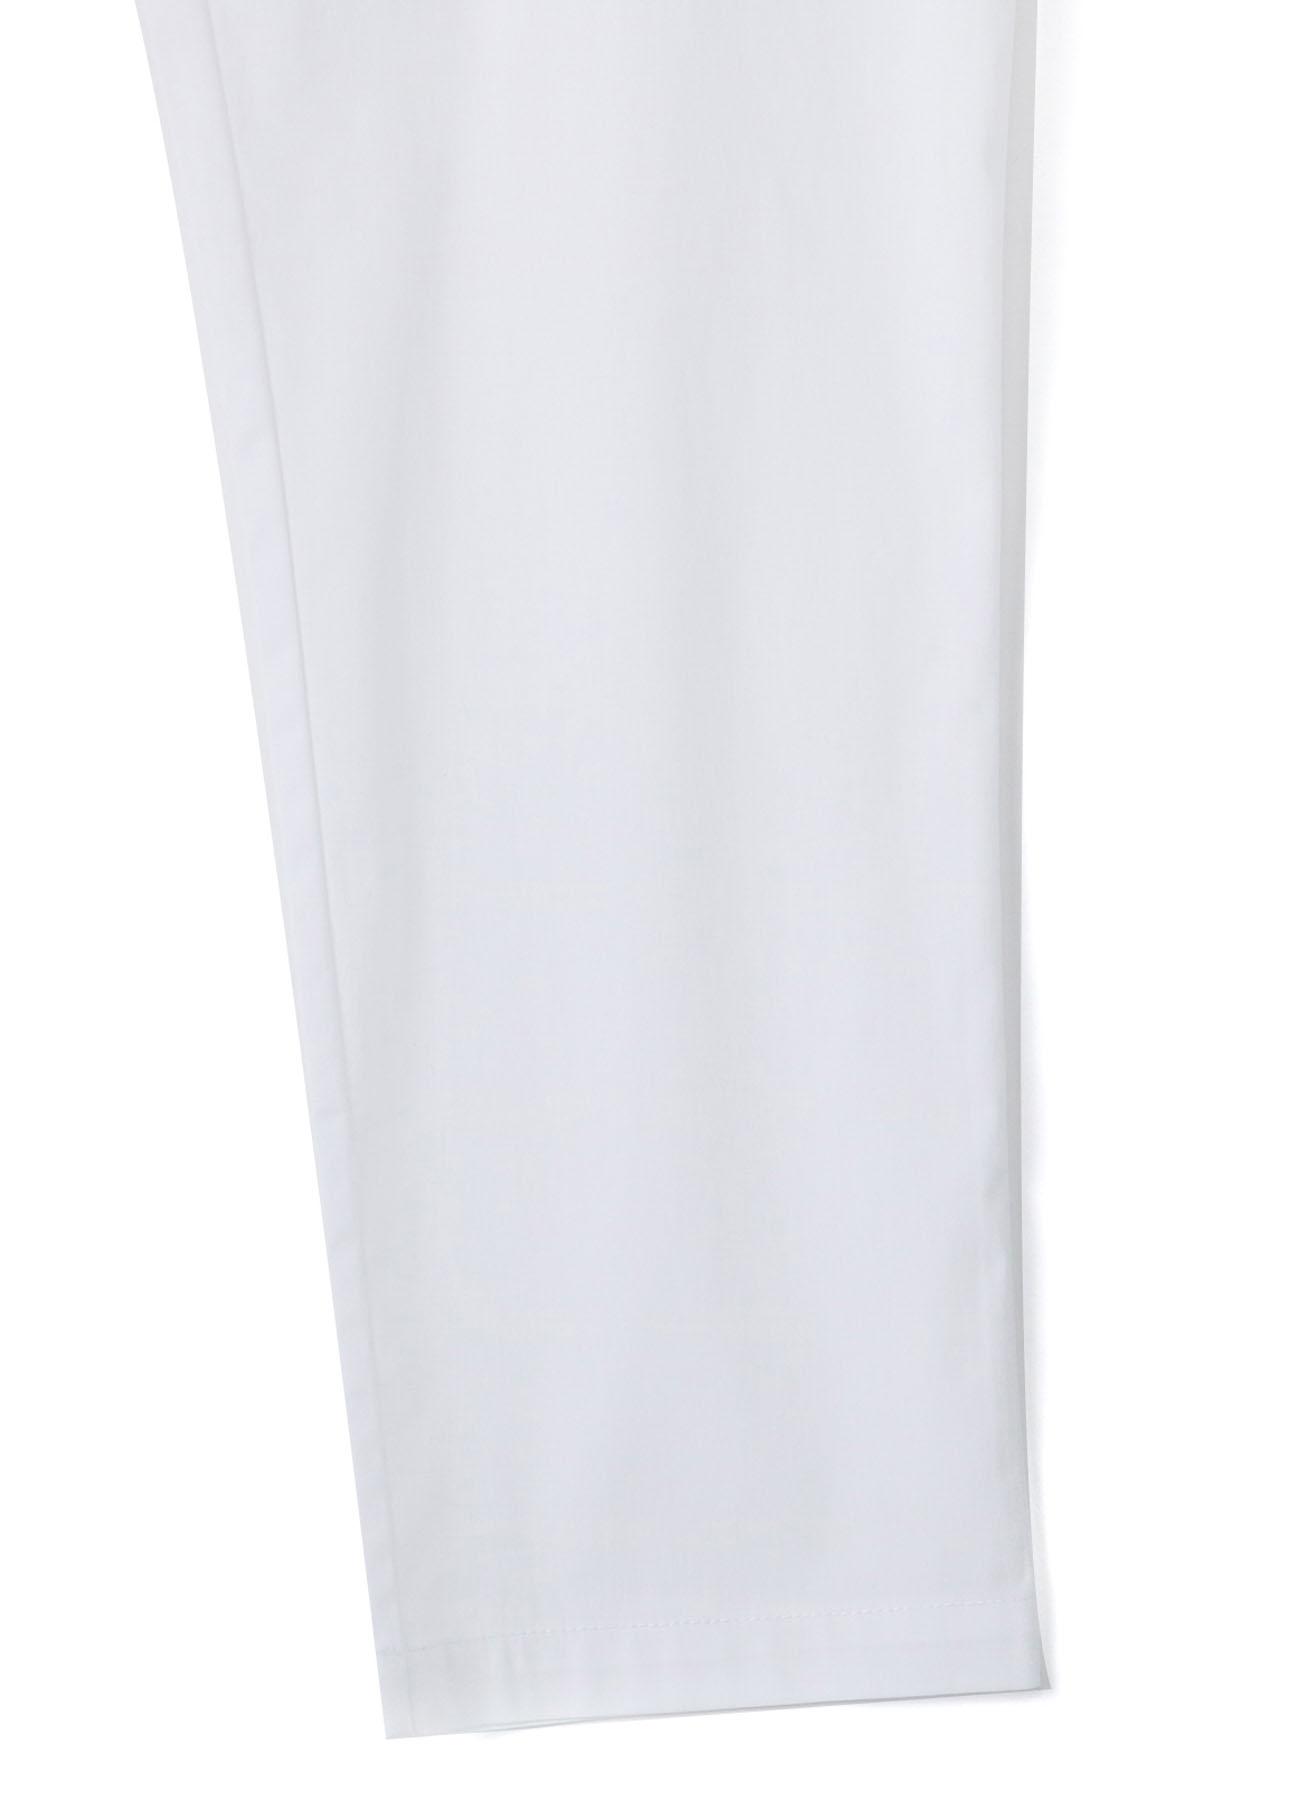 C/N STRETCH SLIM PANTS 4/5 LENGTH